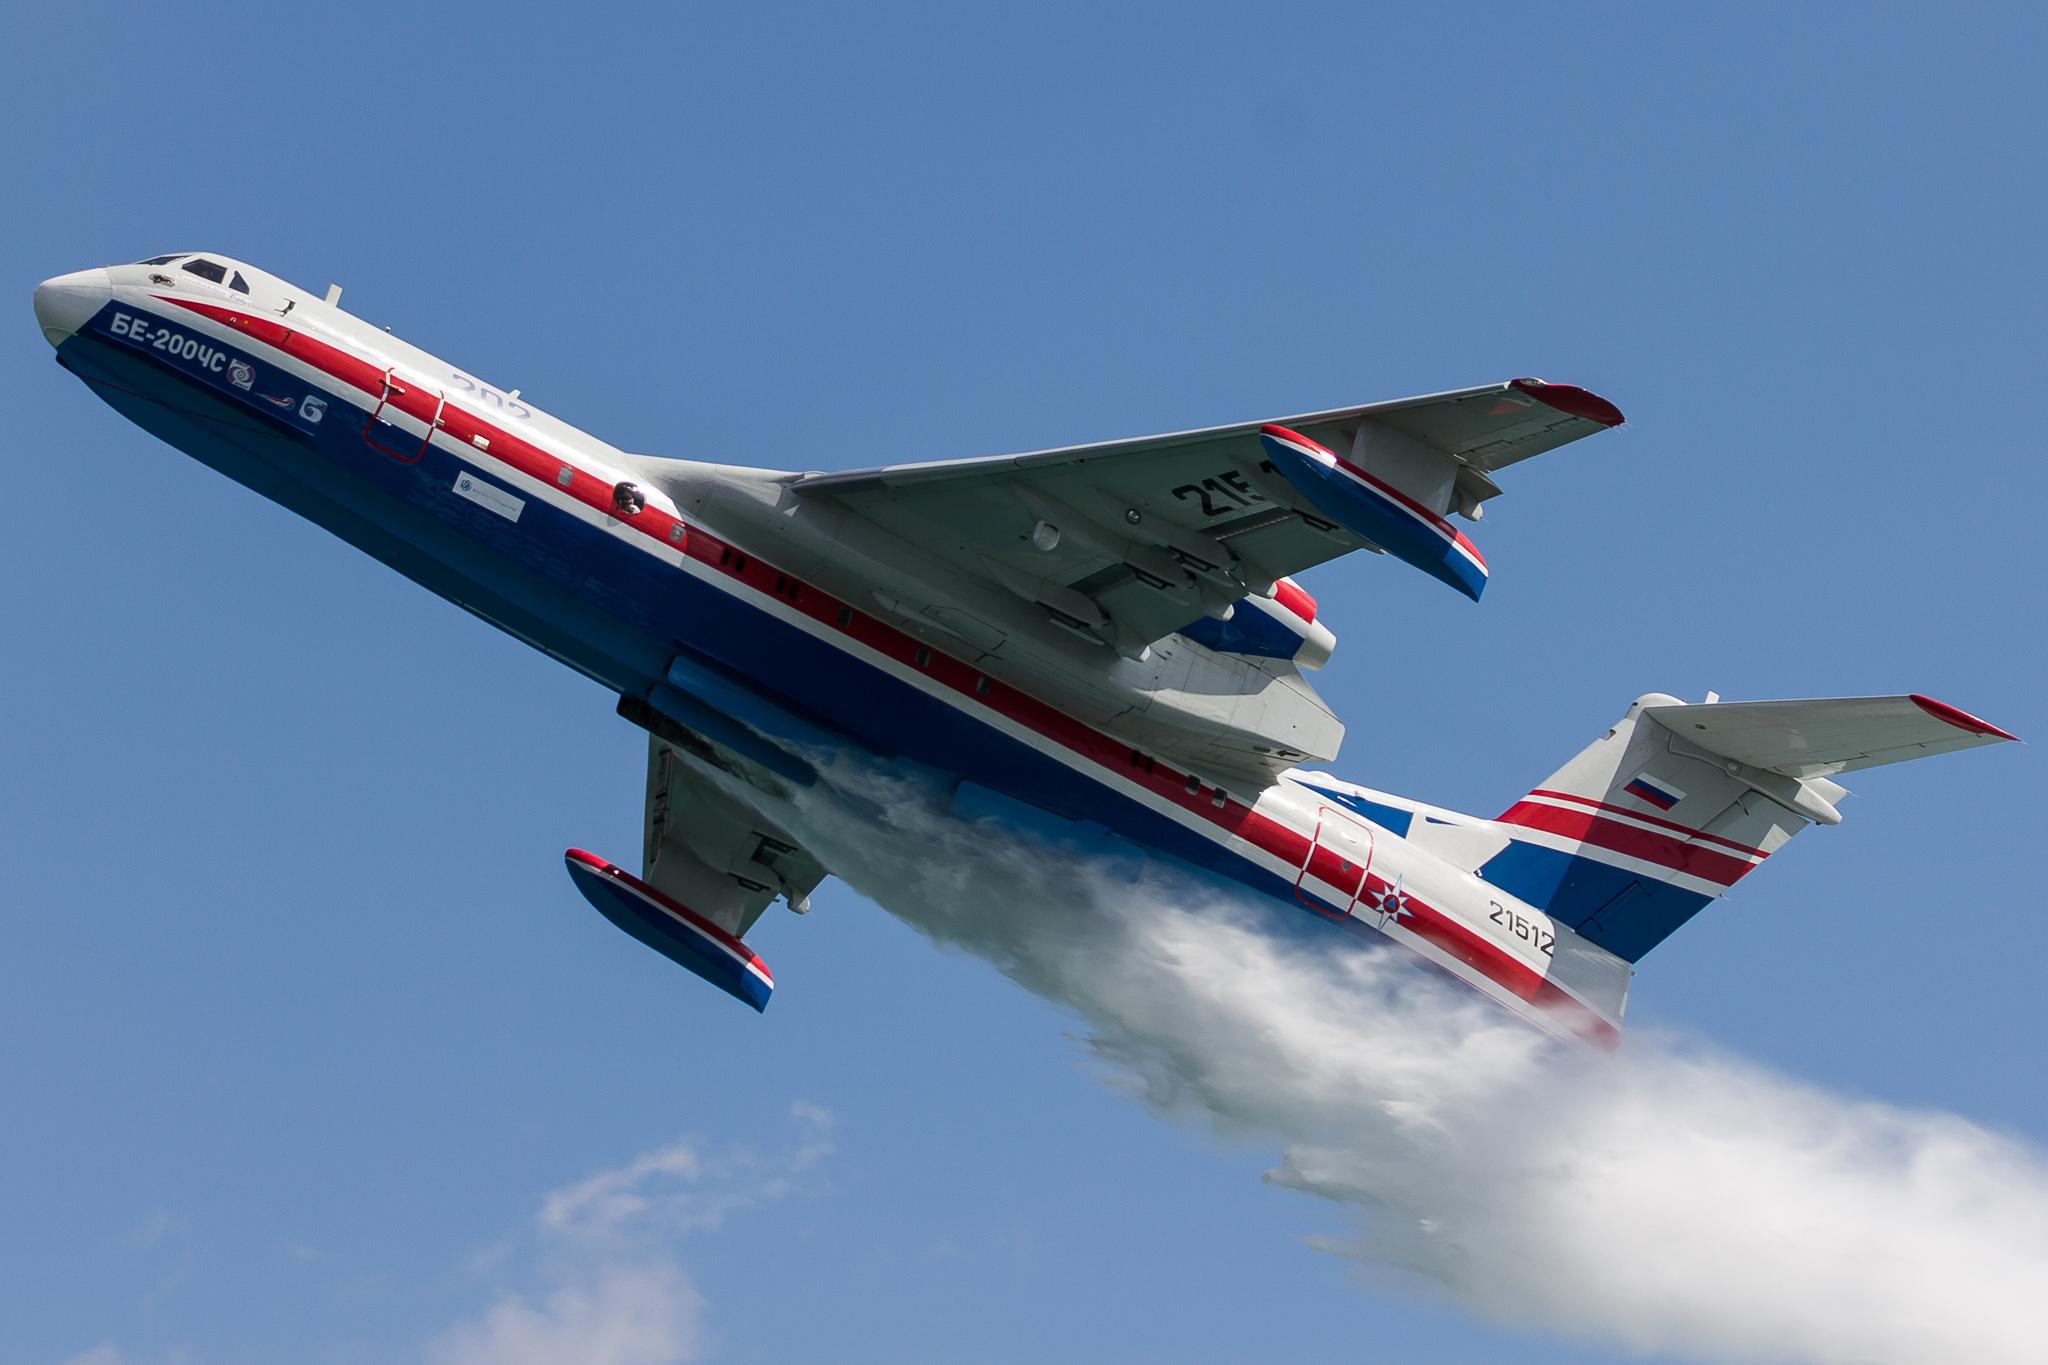 фото самолета бе 12 обои на рабочий стол № 249120 без смс